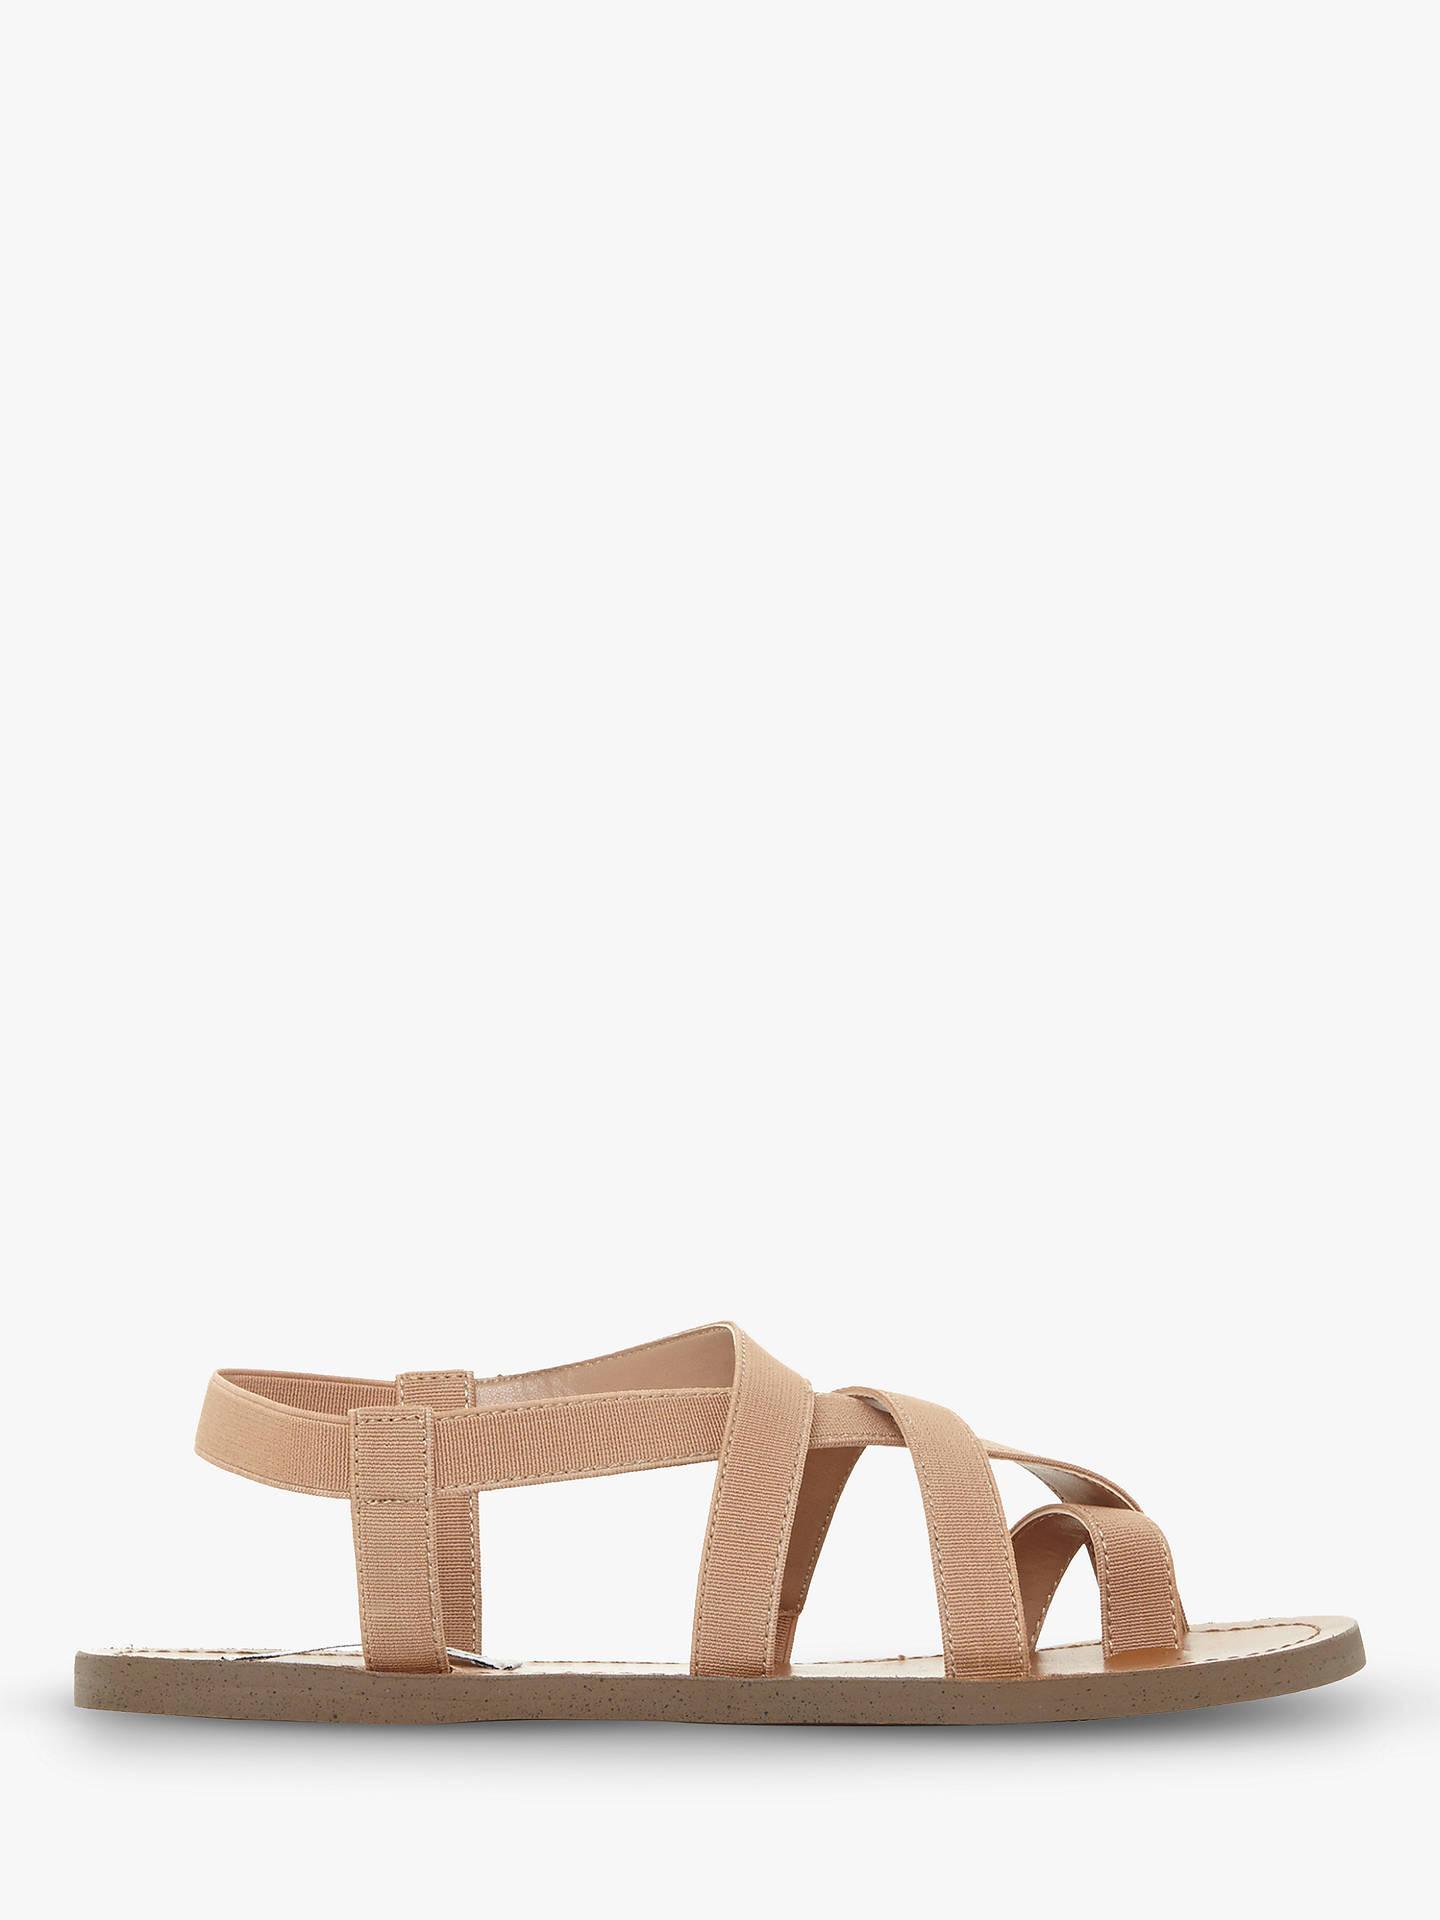 b222c54cf3c Steve Madden Flexie Gladiator Flat Sandals, Tan